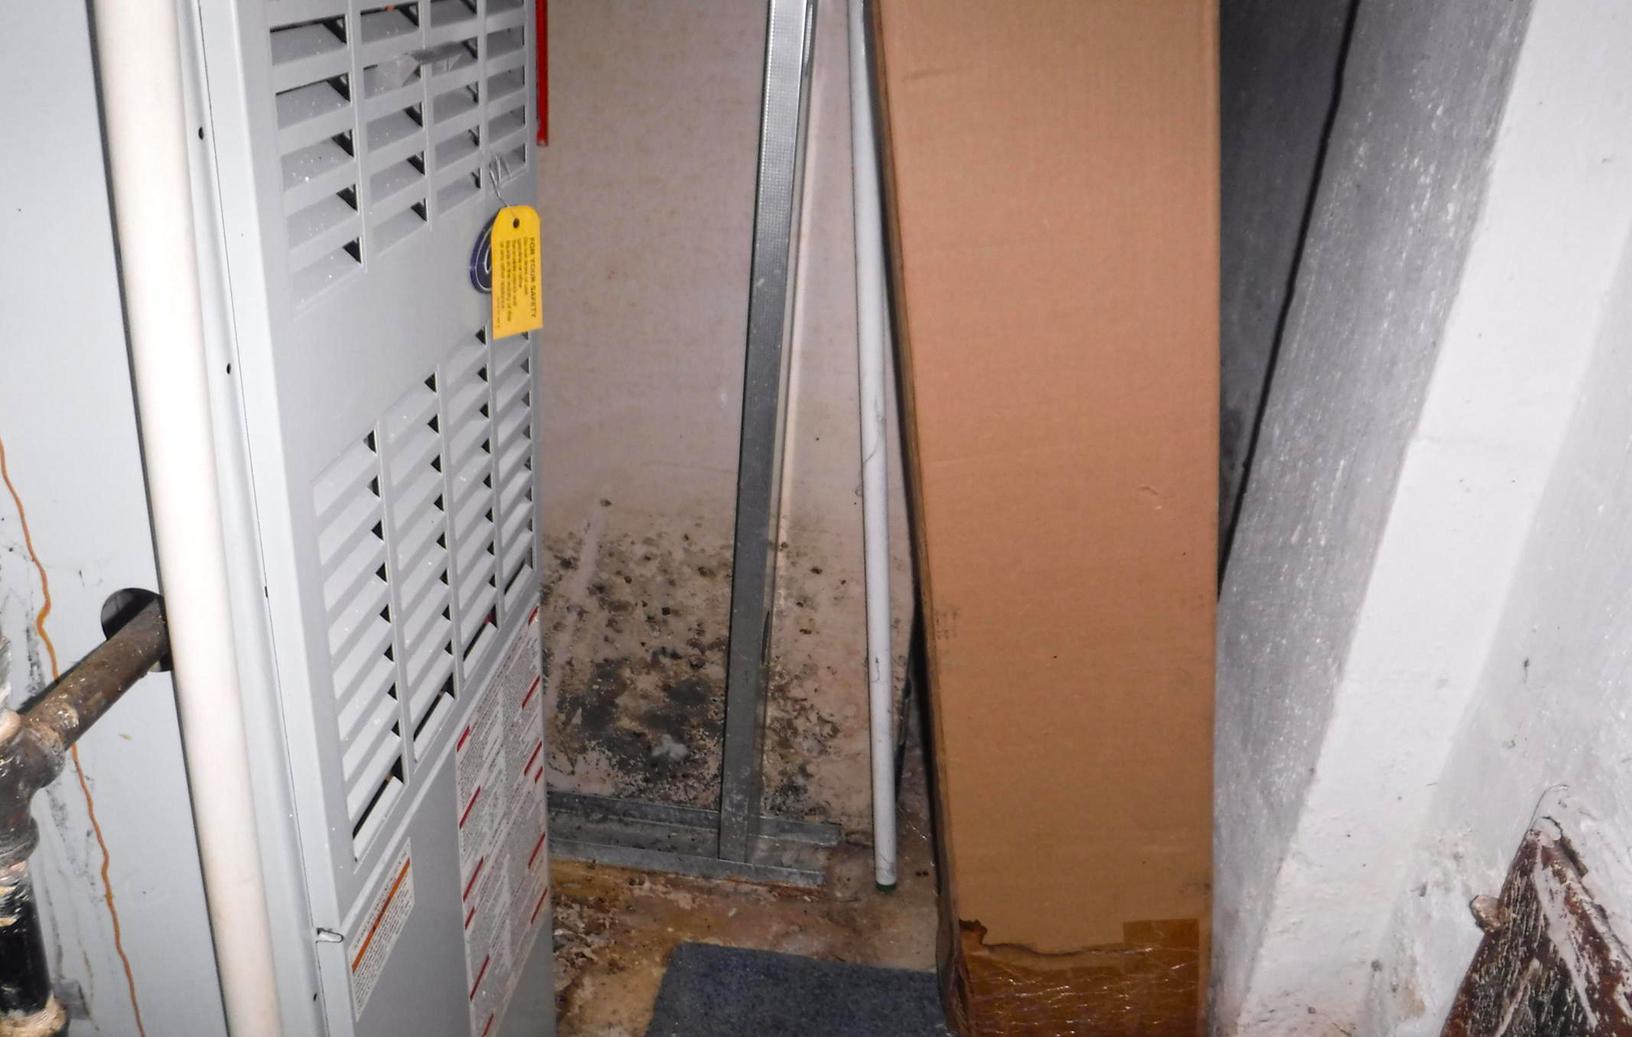 Mold Remediation Step #1